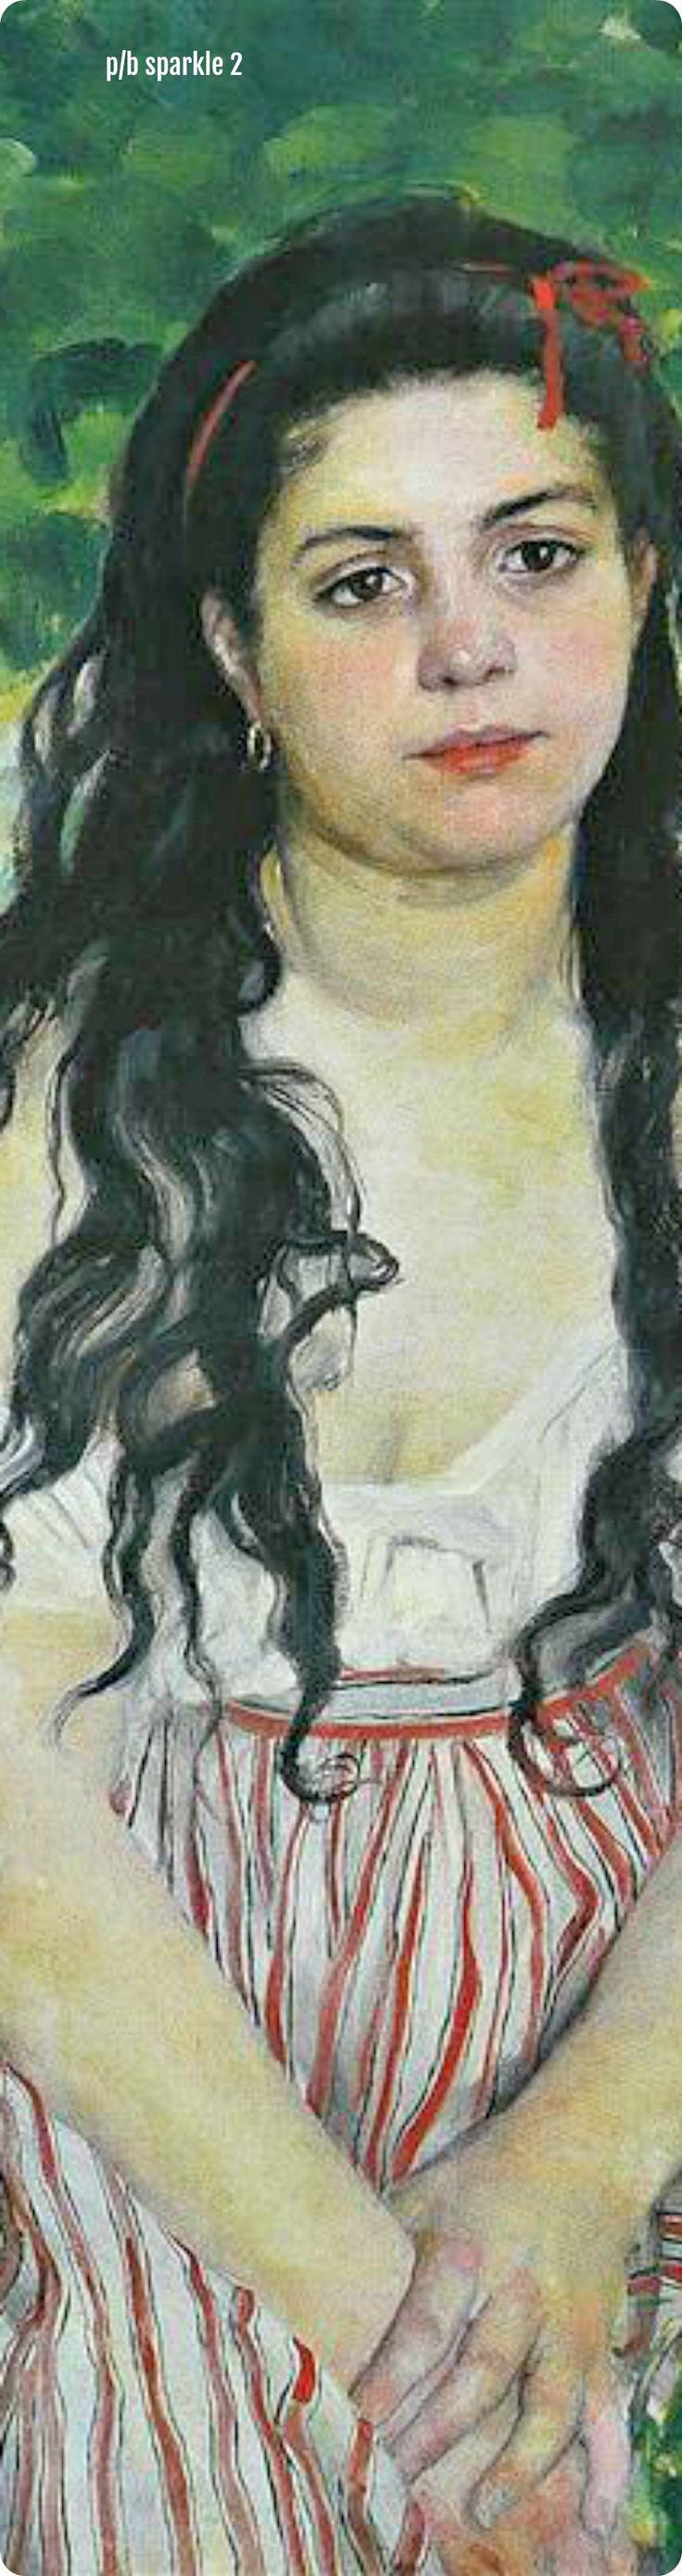 Pierre-Auguste Renoir (1841-1919): In Summer (The Gypsy), 1868